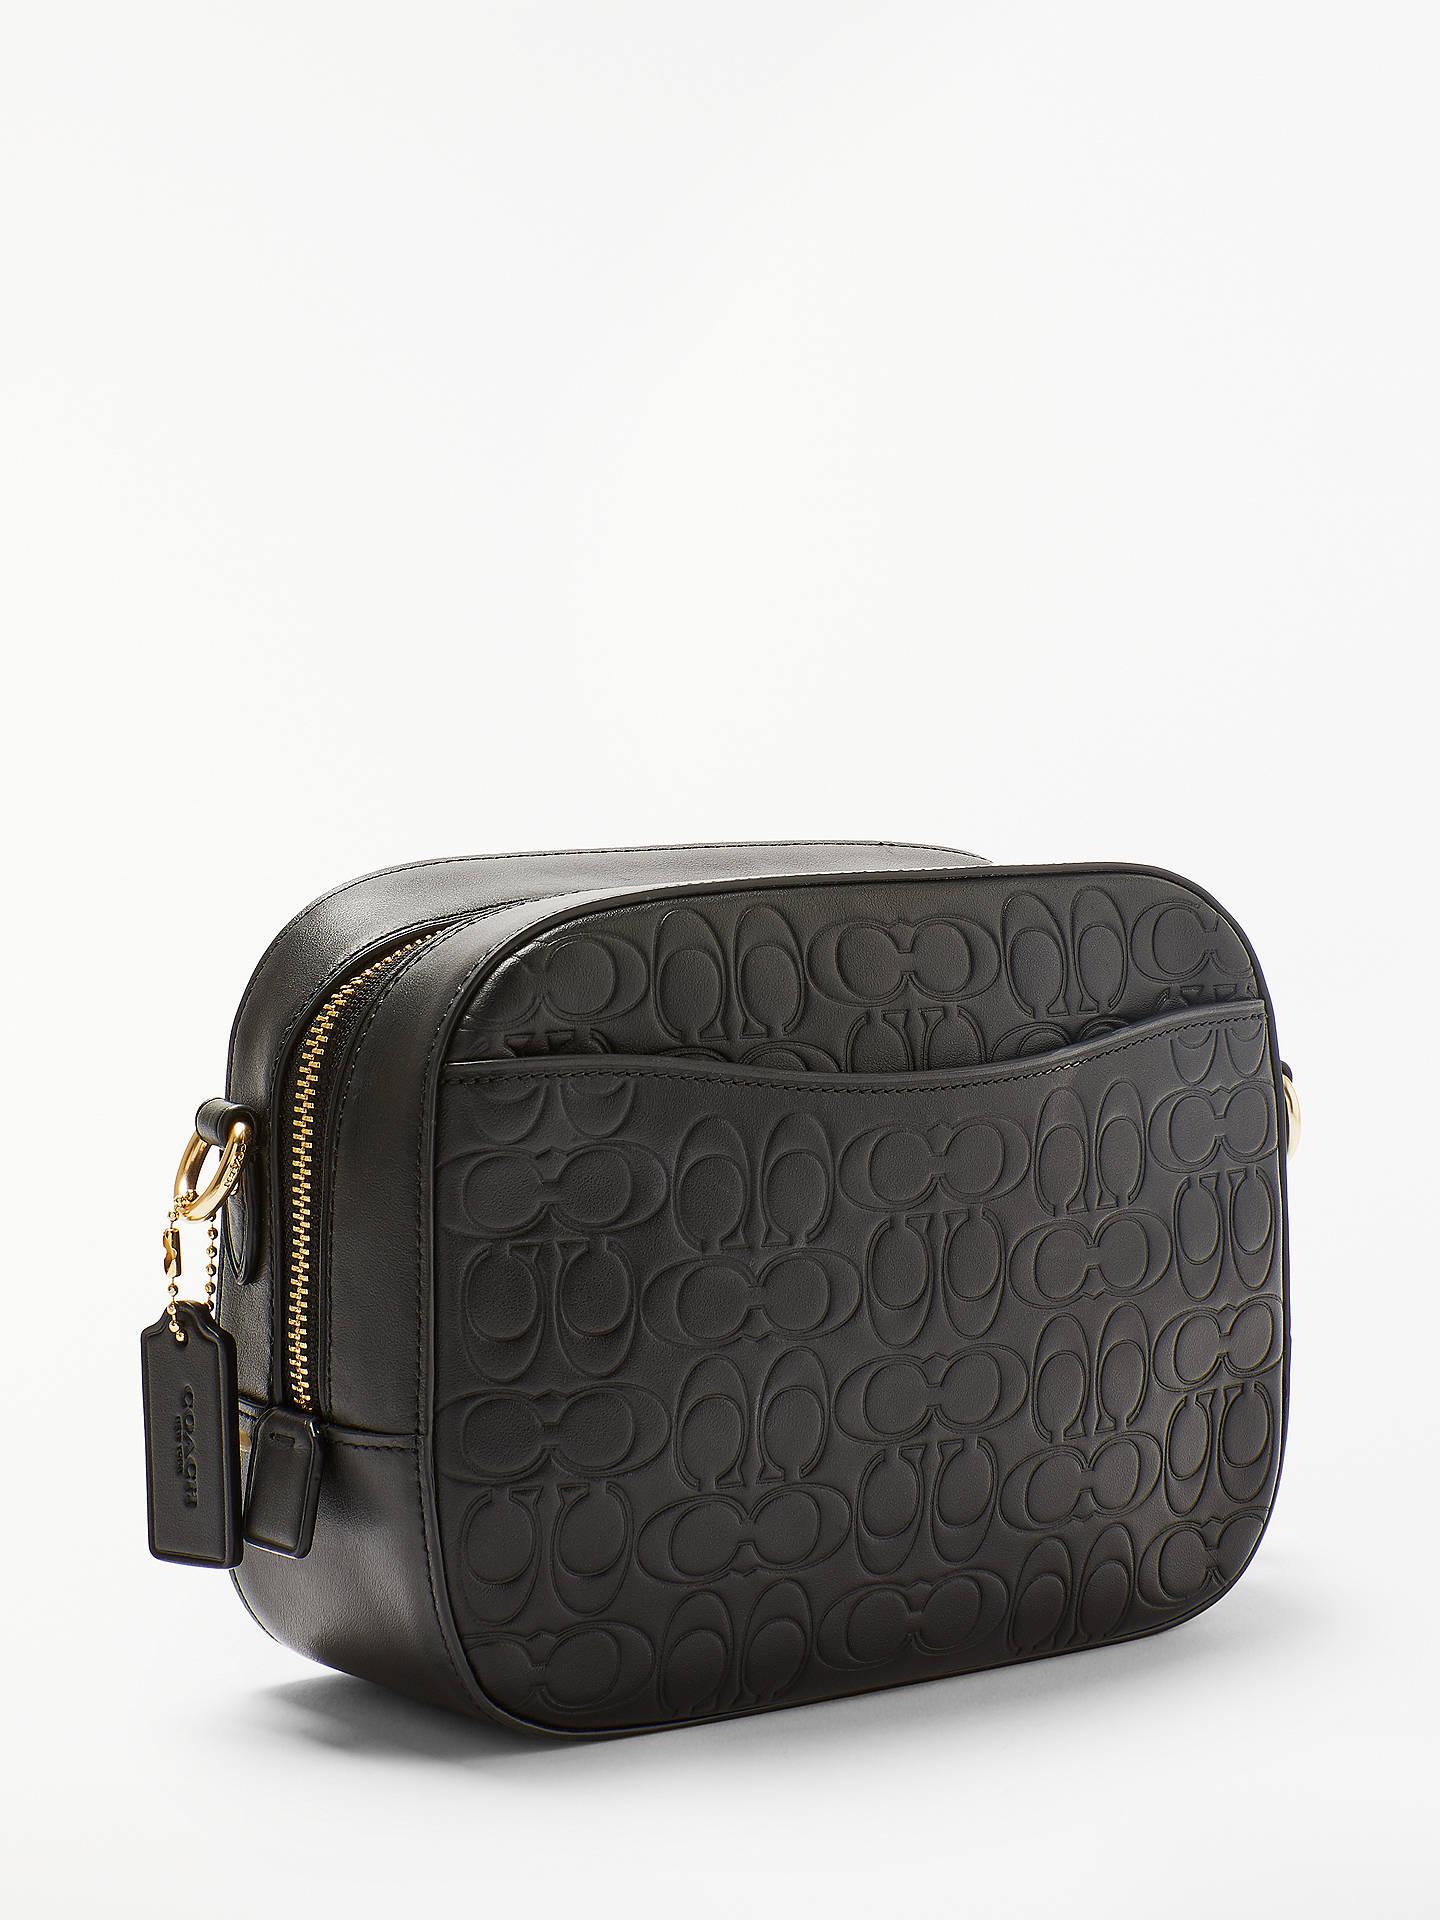 13020fce669c Coach Signature Embossed Leather Camera Bag, Black